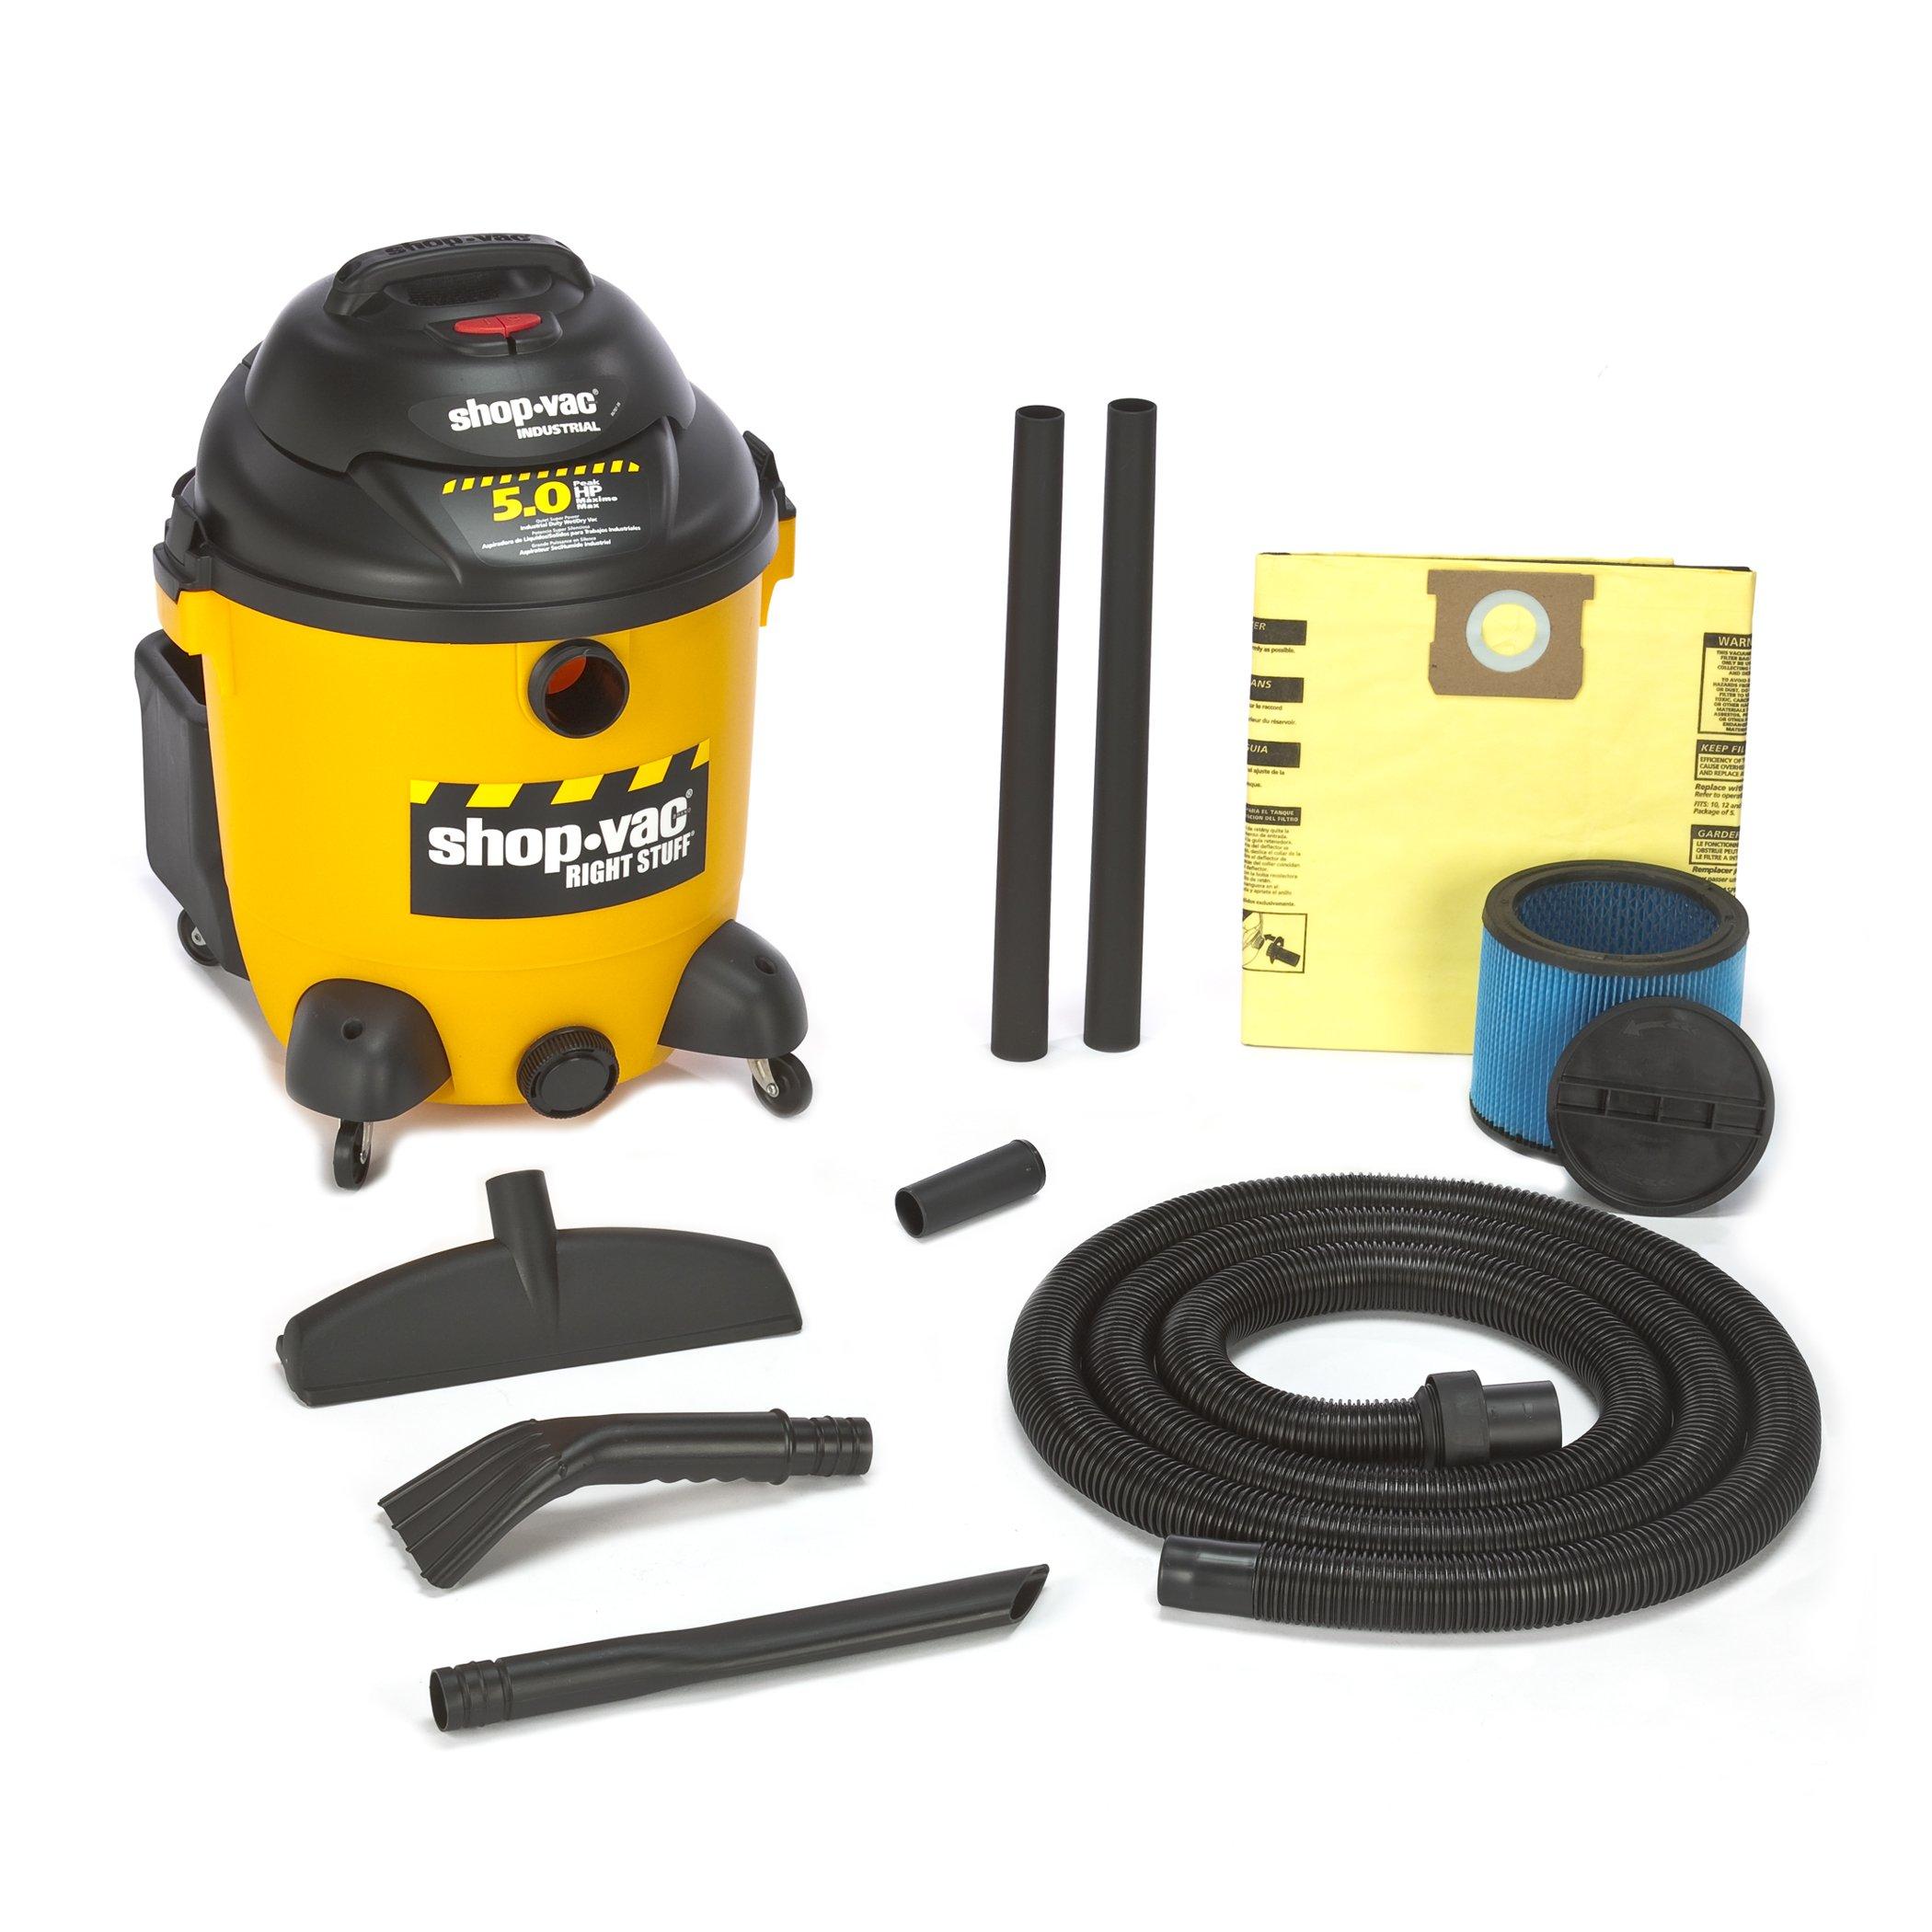 Shop-Vac 9625110 5.0-Peak Horsepower Right Stuff Wet/Dry Vacuum, 12-Gallon by Shop-Vac